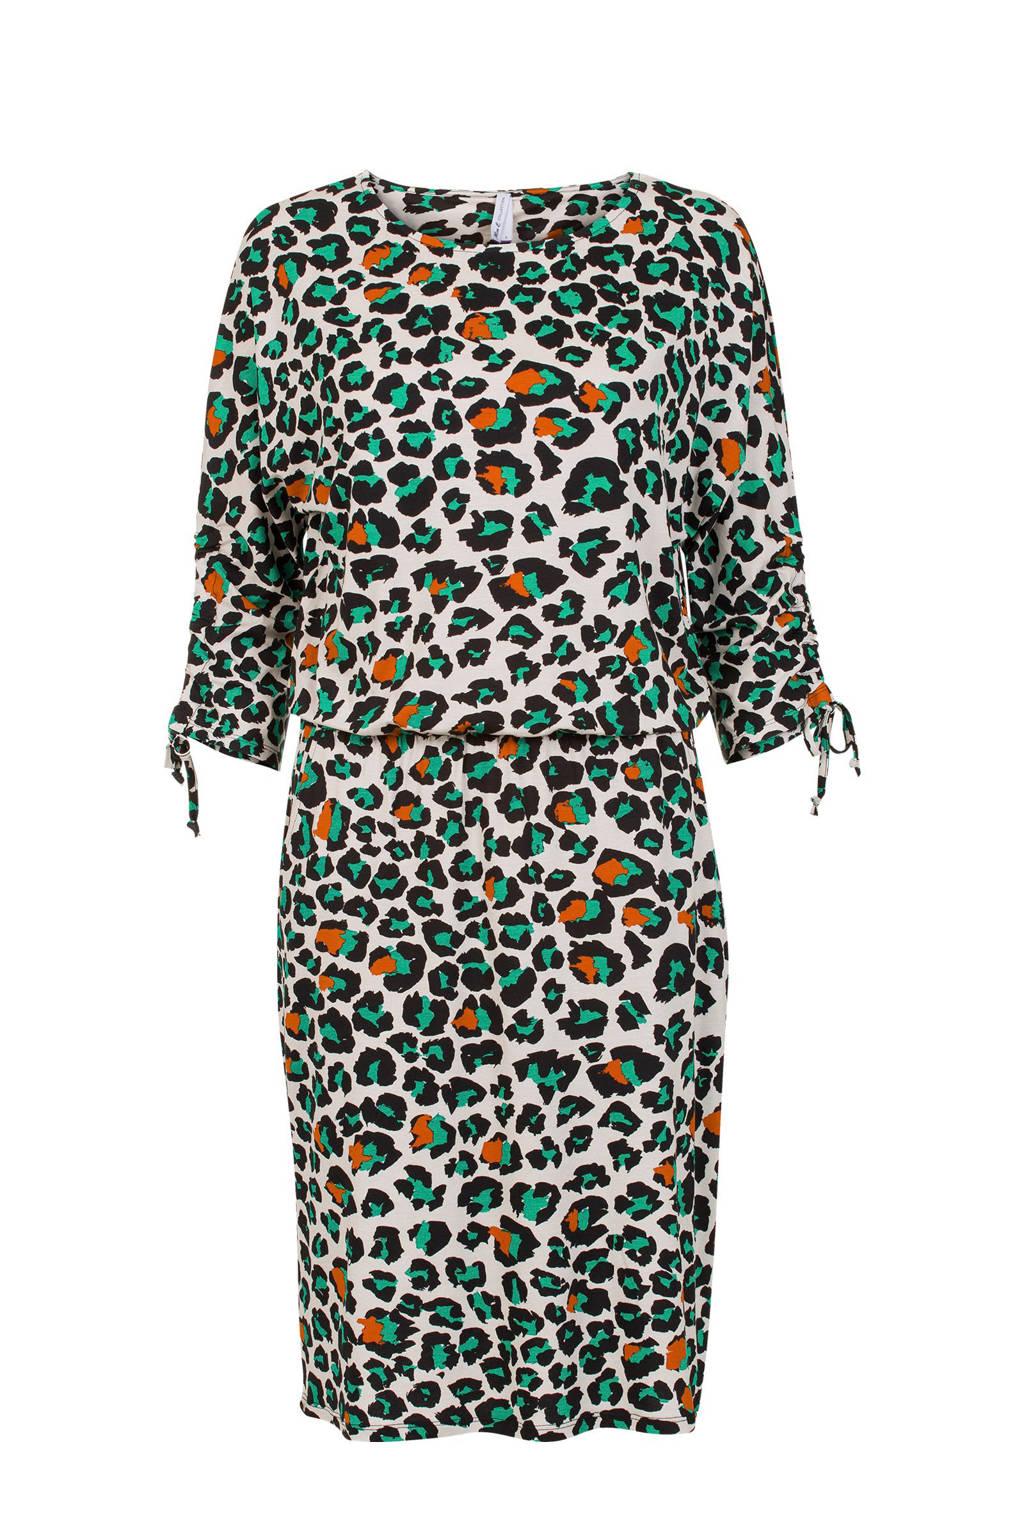 Miss Etam Regulier jurk met luipaardprint, Groen/oranje/wit/zwart